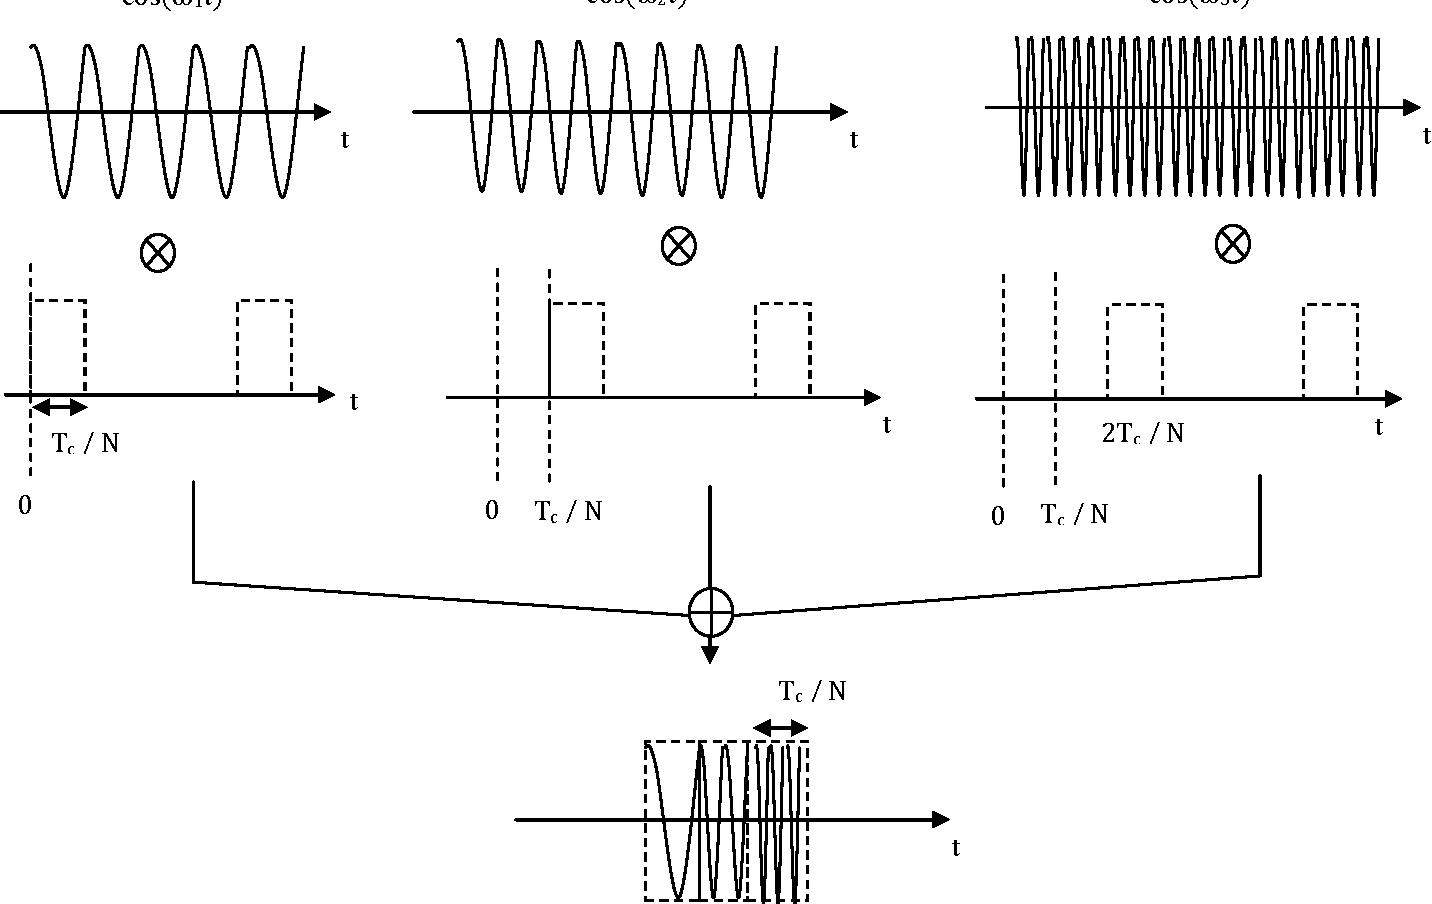 m ary psk transmitter block diagram m ary psk receiver block diagram